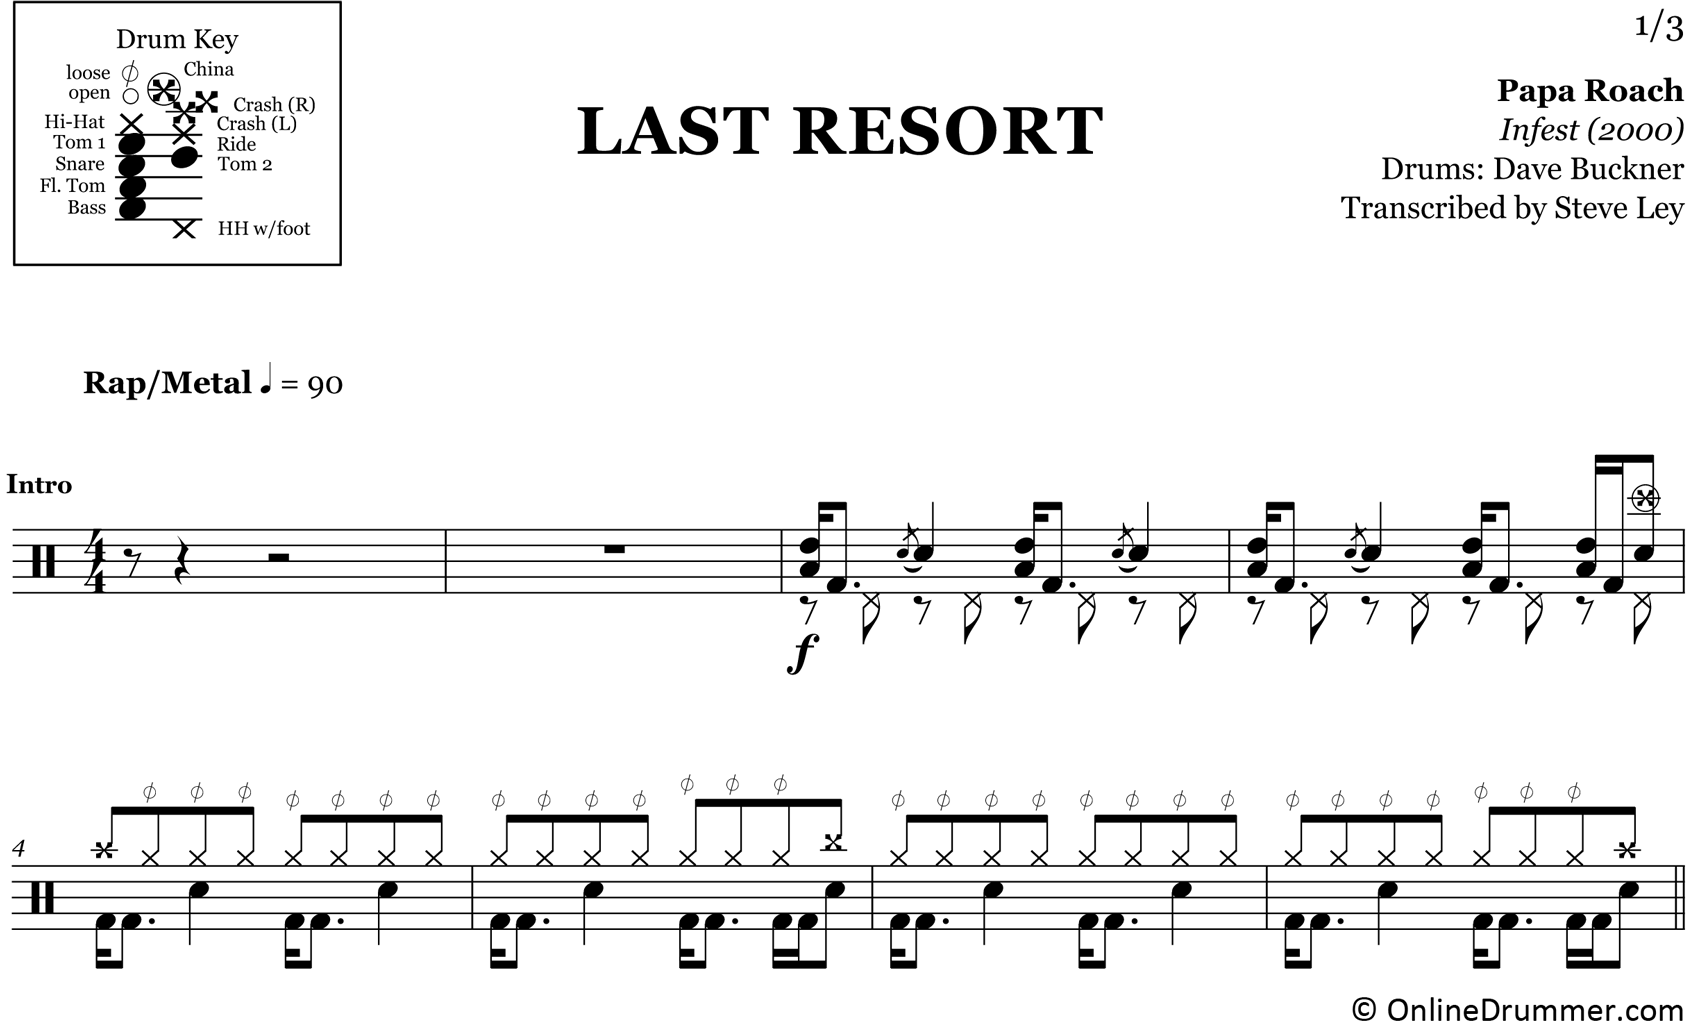 Last Resort - Papa Roach - Drum Sheet Music